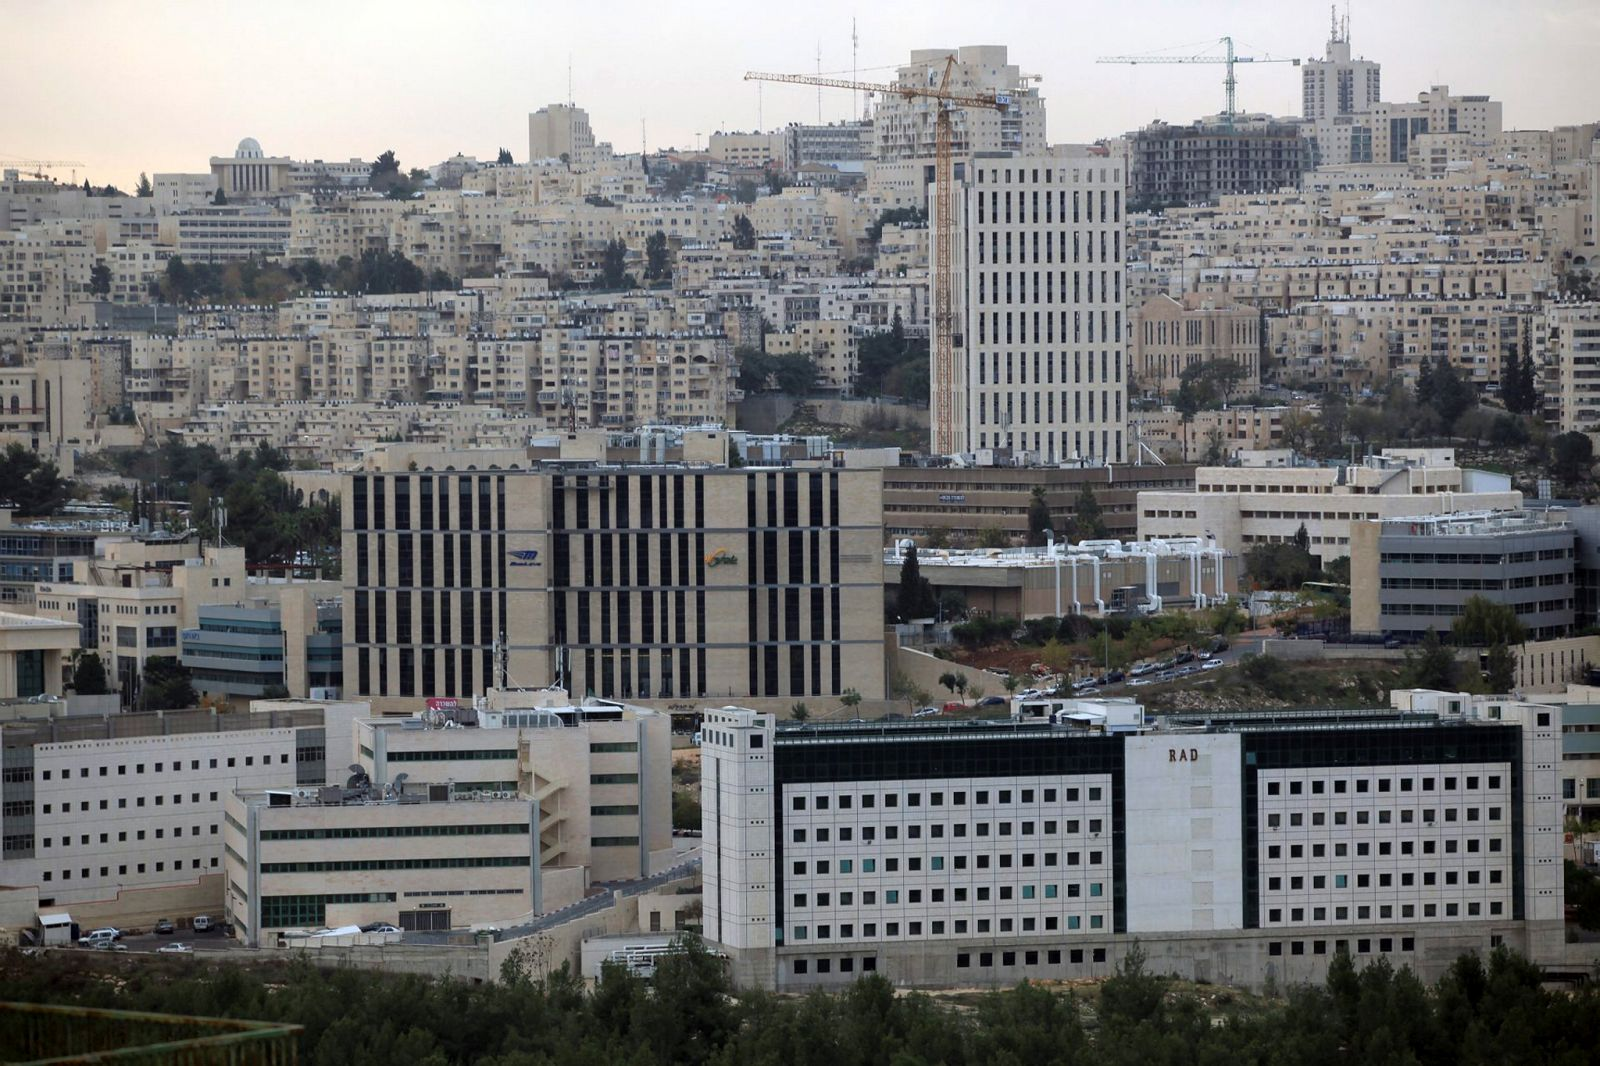 Jerusalem Israel S Burgeoning High Tech Capital Israel21c